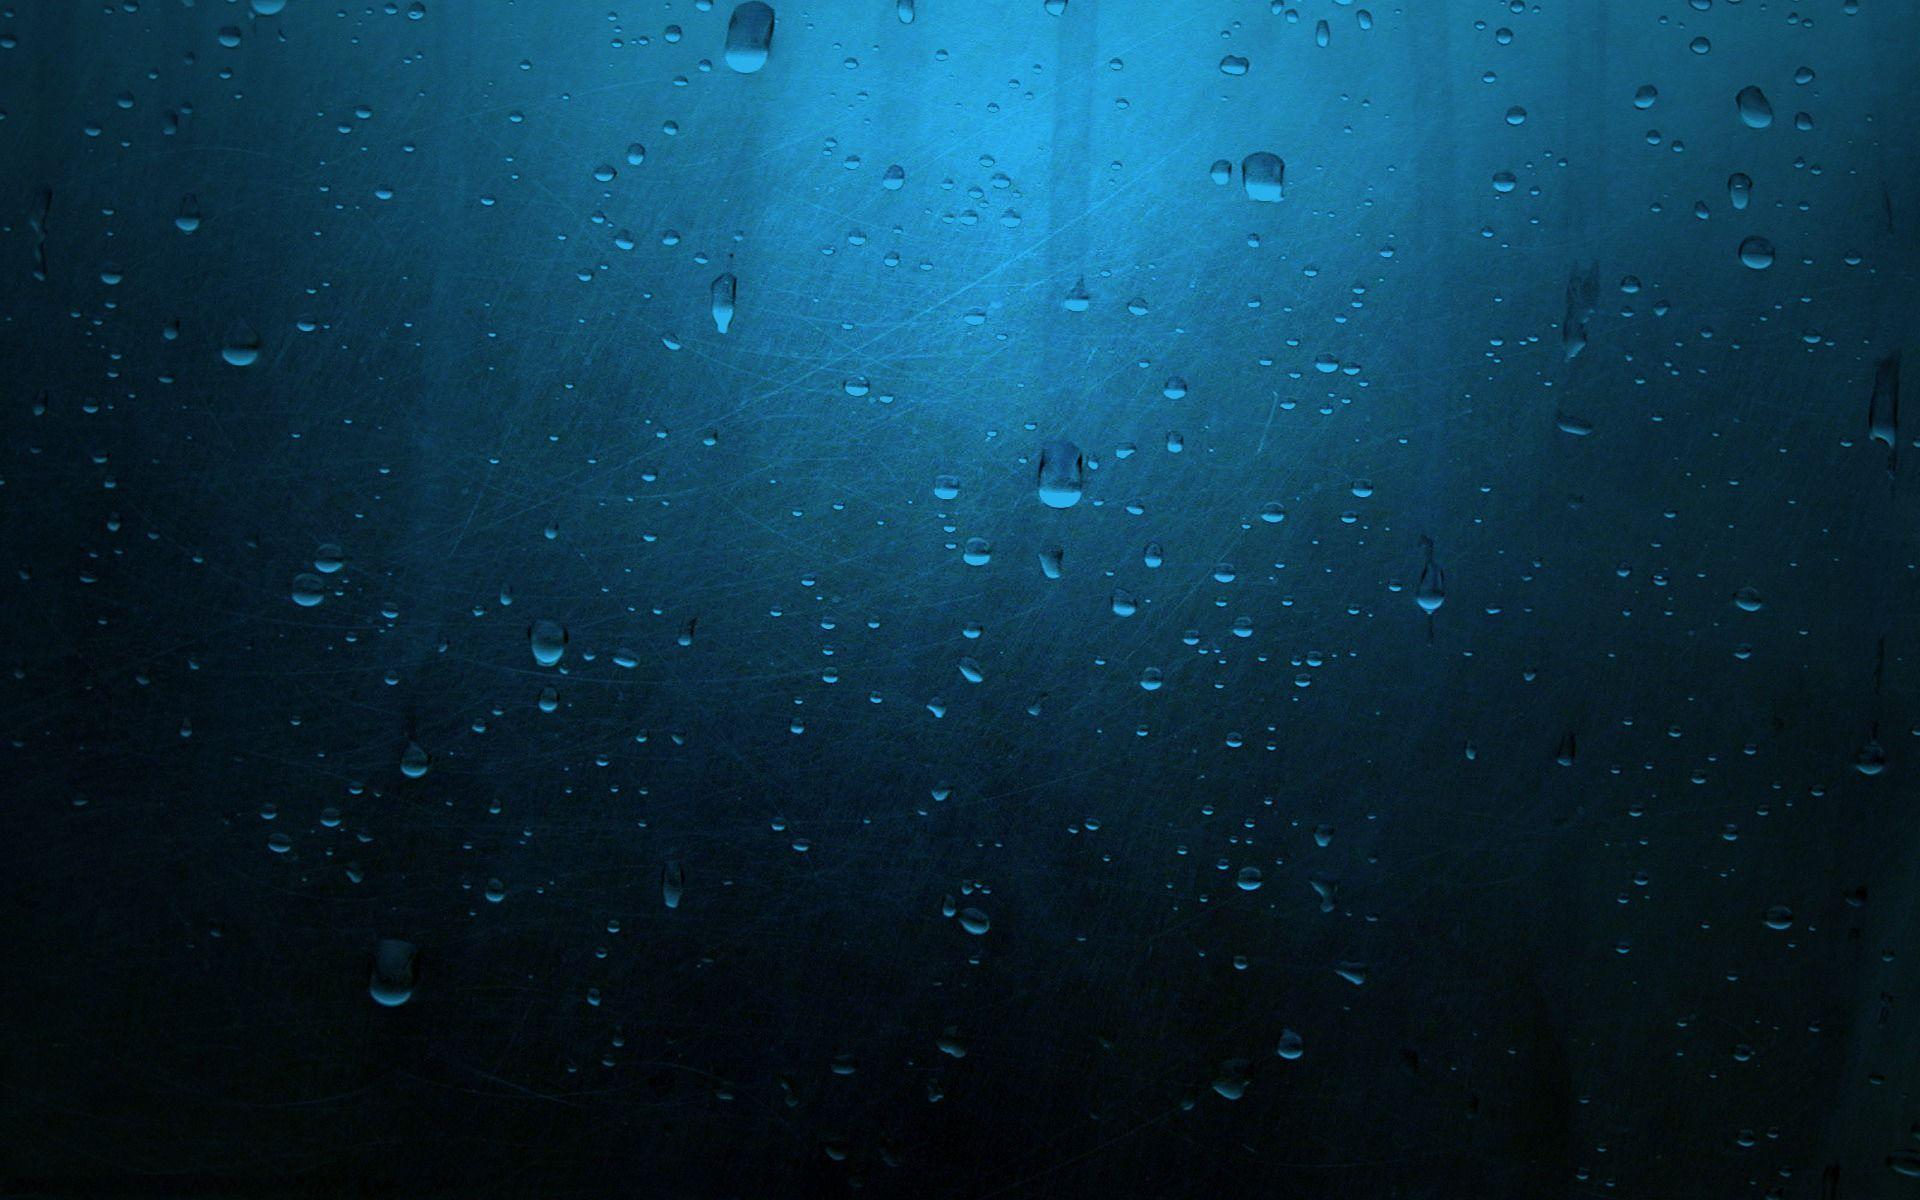 Underwater Backgrounds - Wallpaper Cave